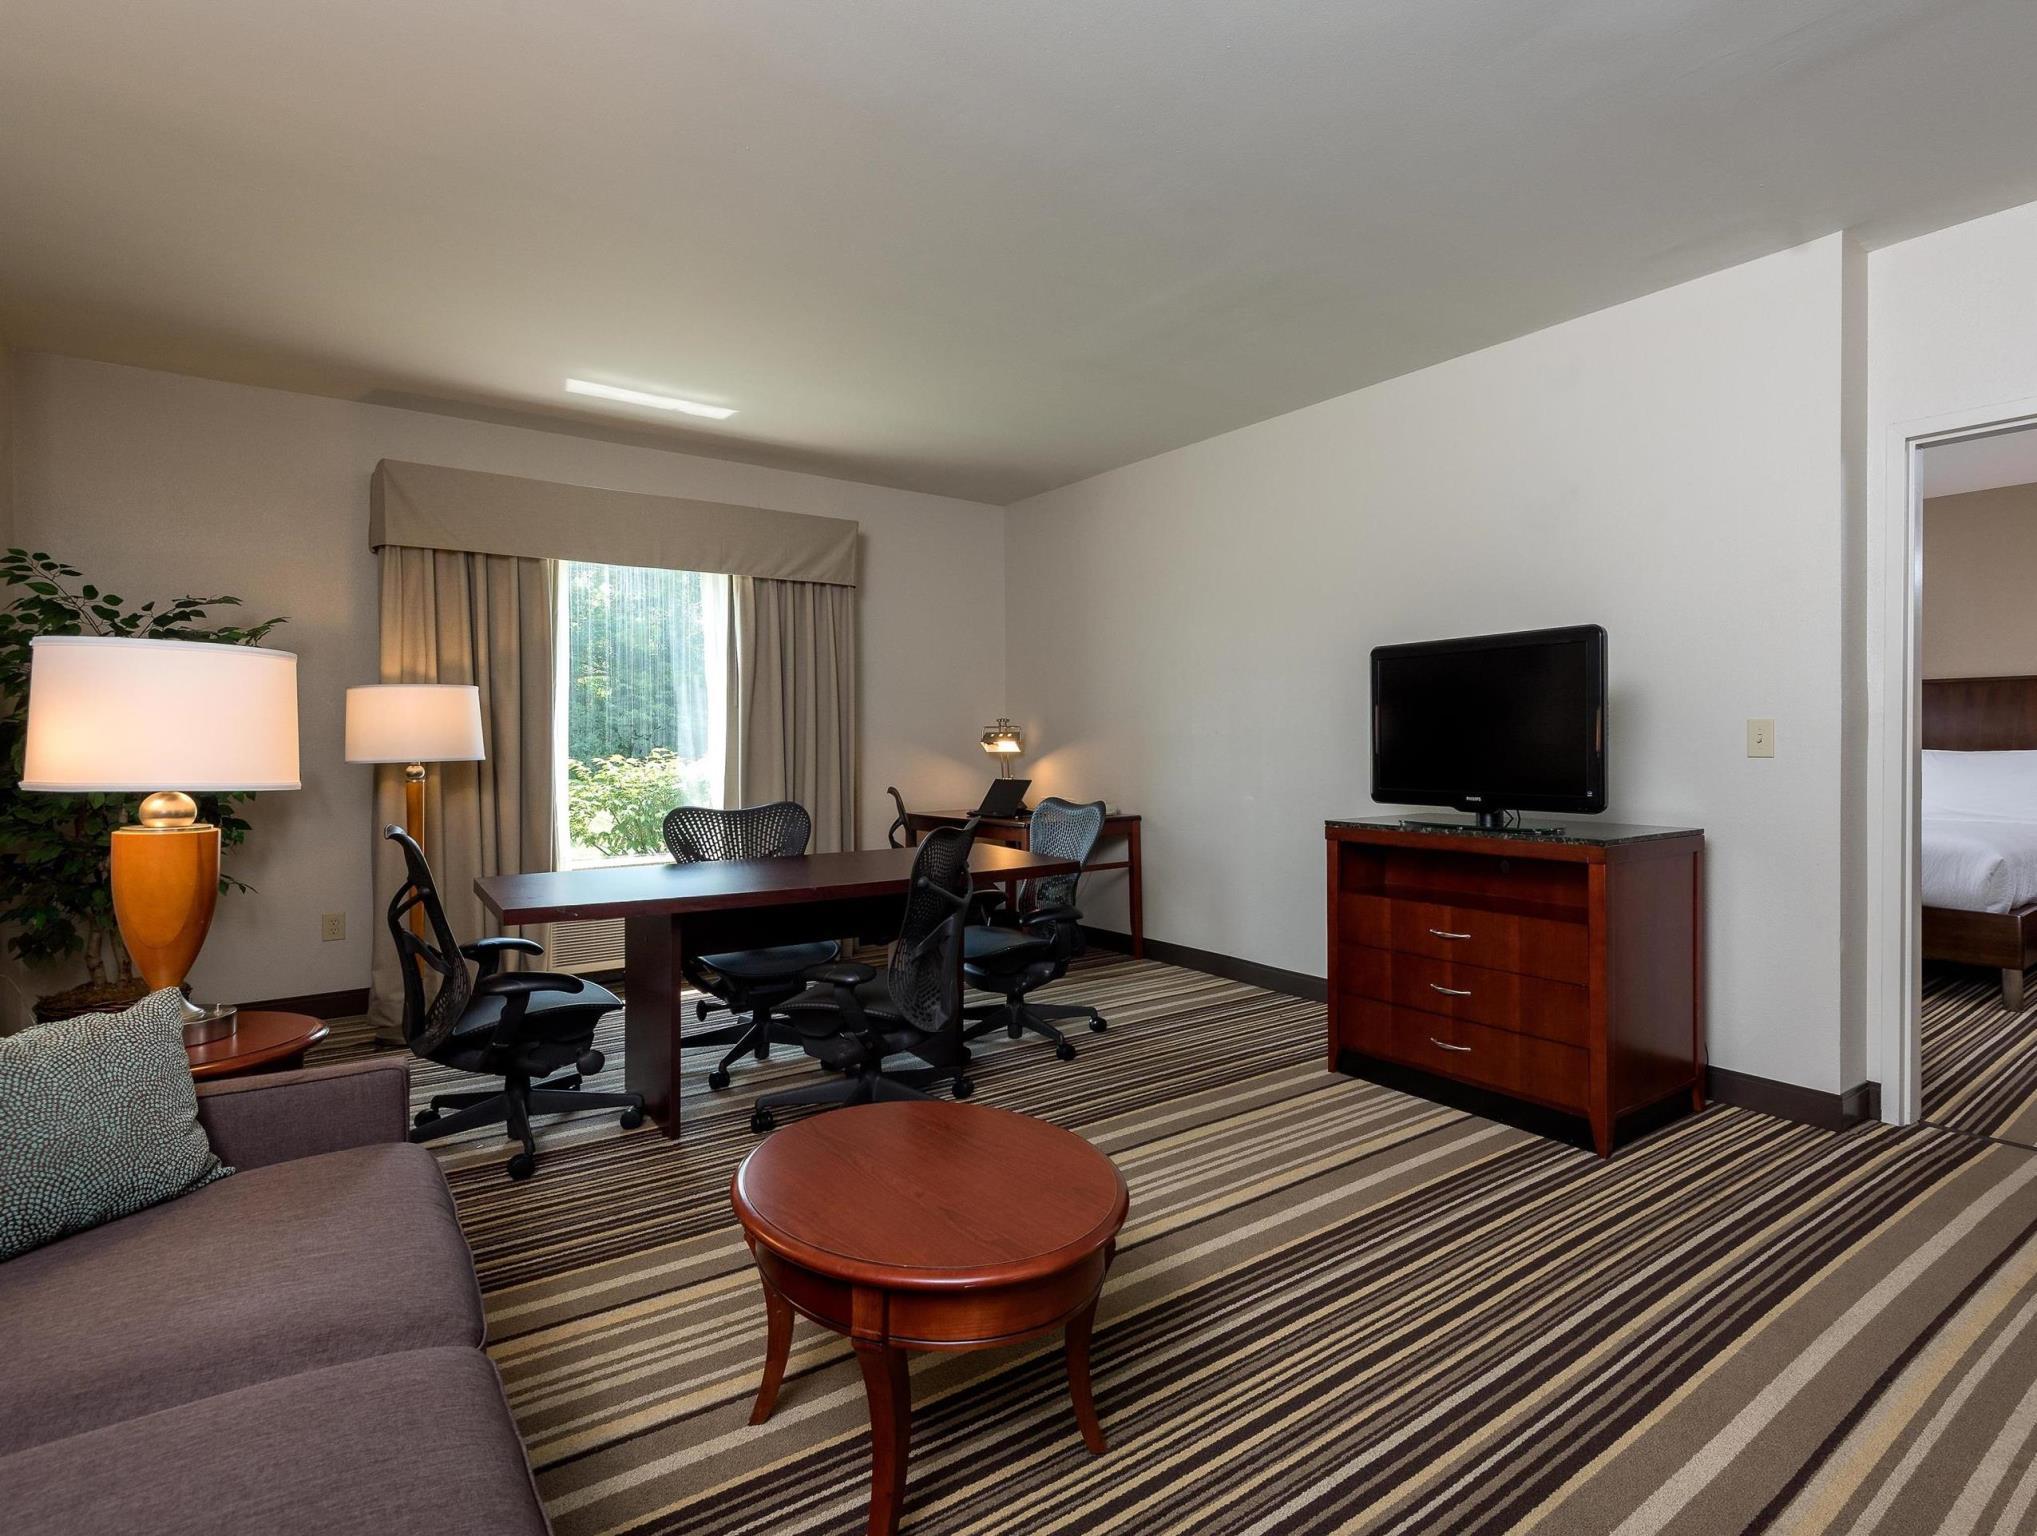 More About Hilton Garden Inn Philadelphia Ft. Washington Nice Design